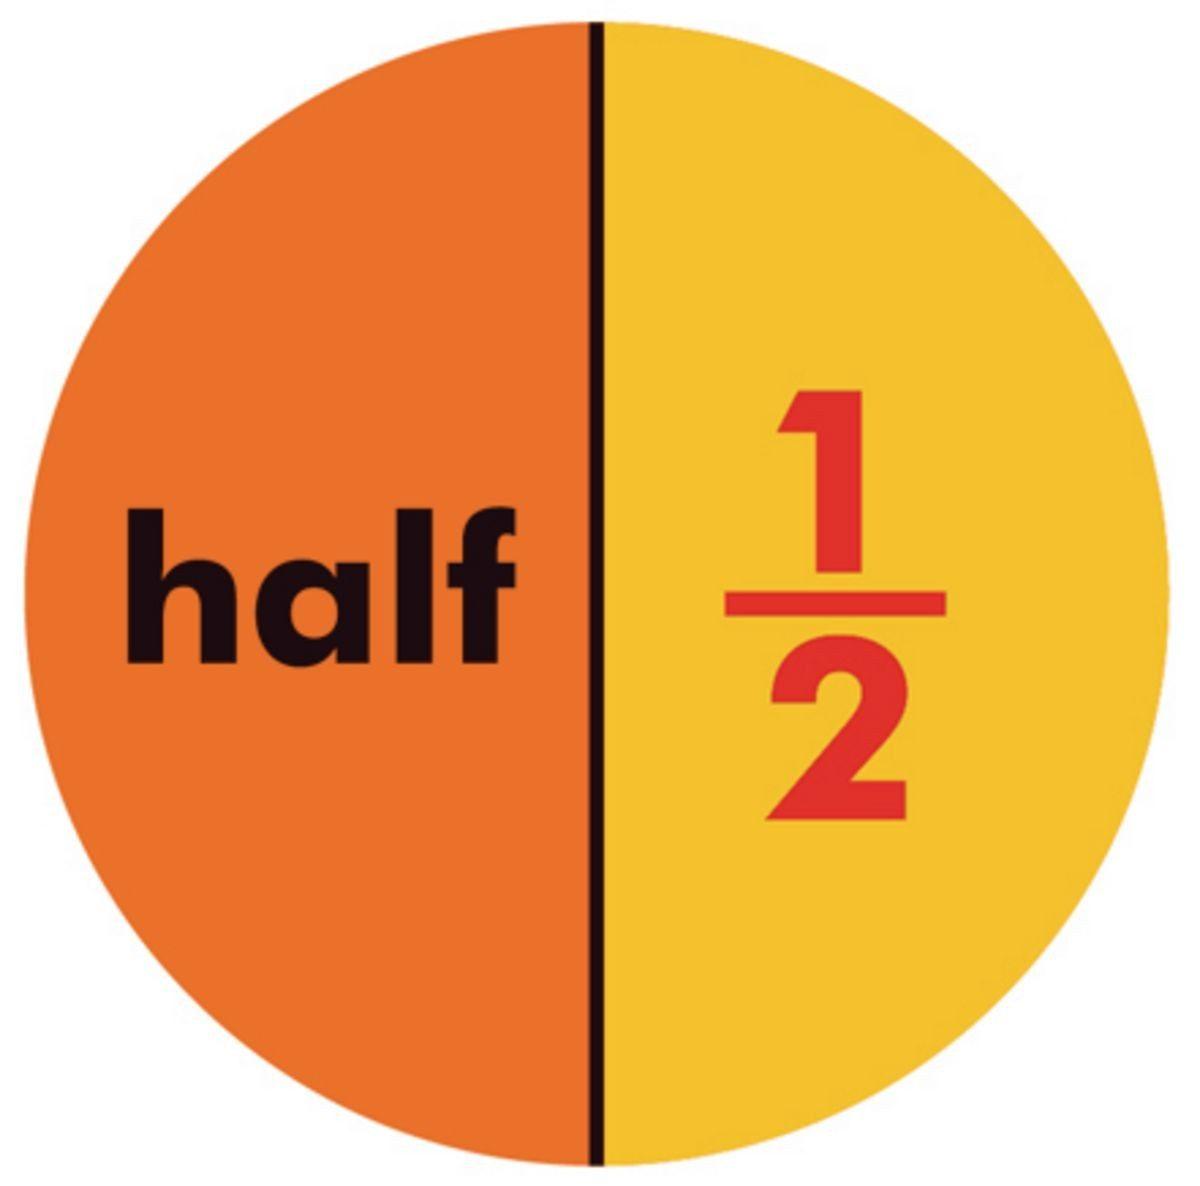 P7 Maths Homework Fractions Friday 28th October